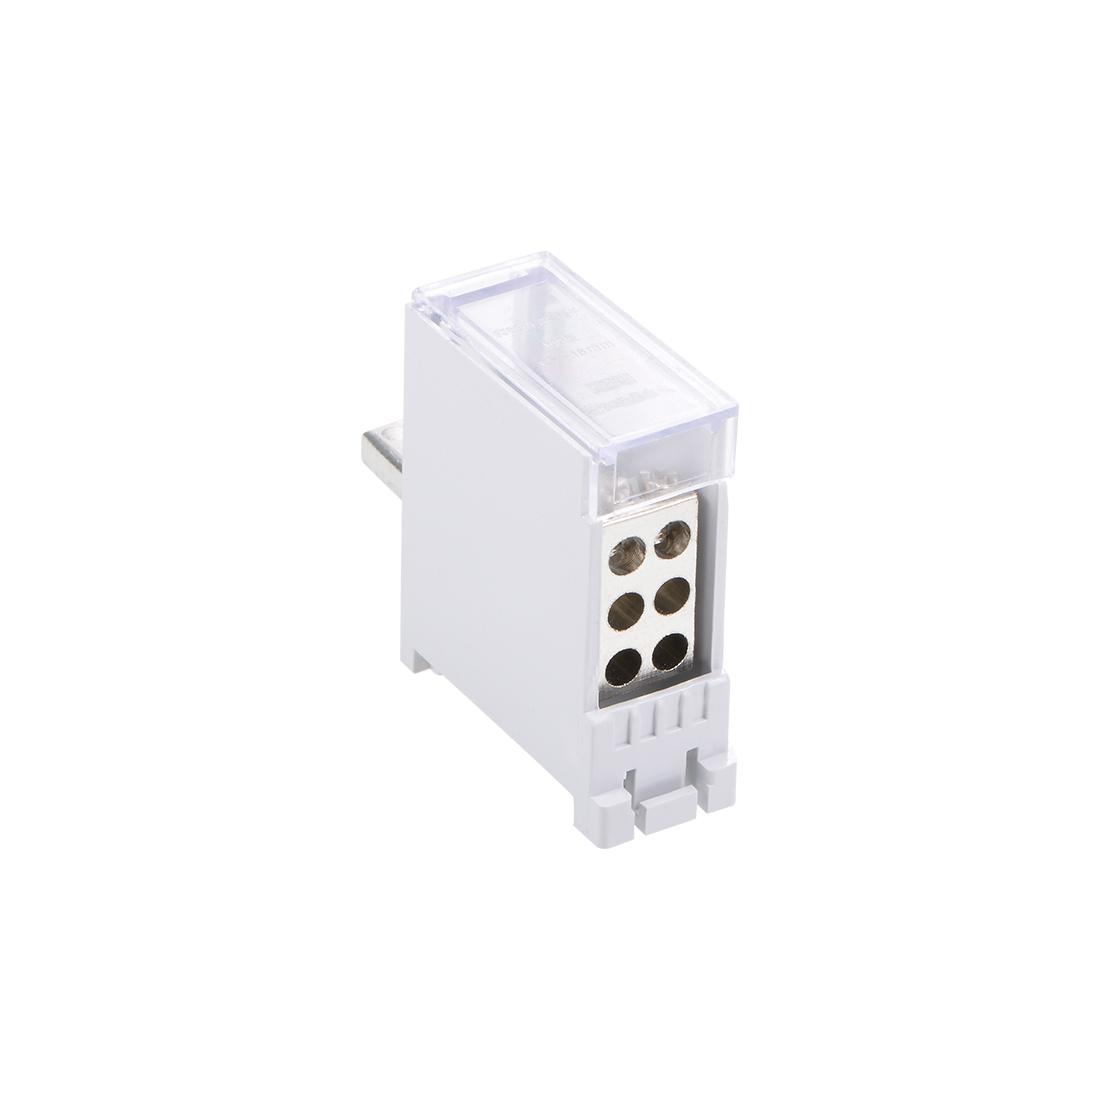 1 Inlet 6 Outlet Terminal Blocks DIN Rail Distribution Block for Circuit Breaker